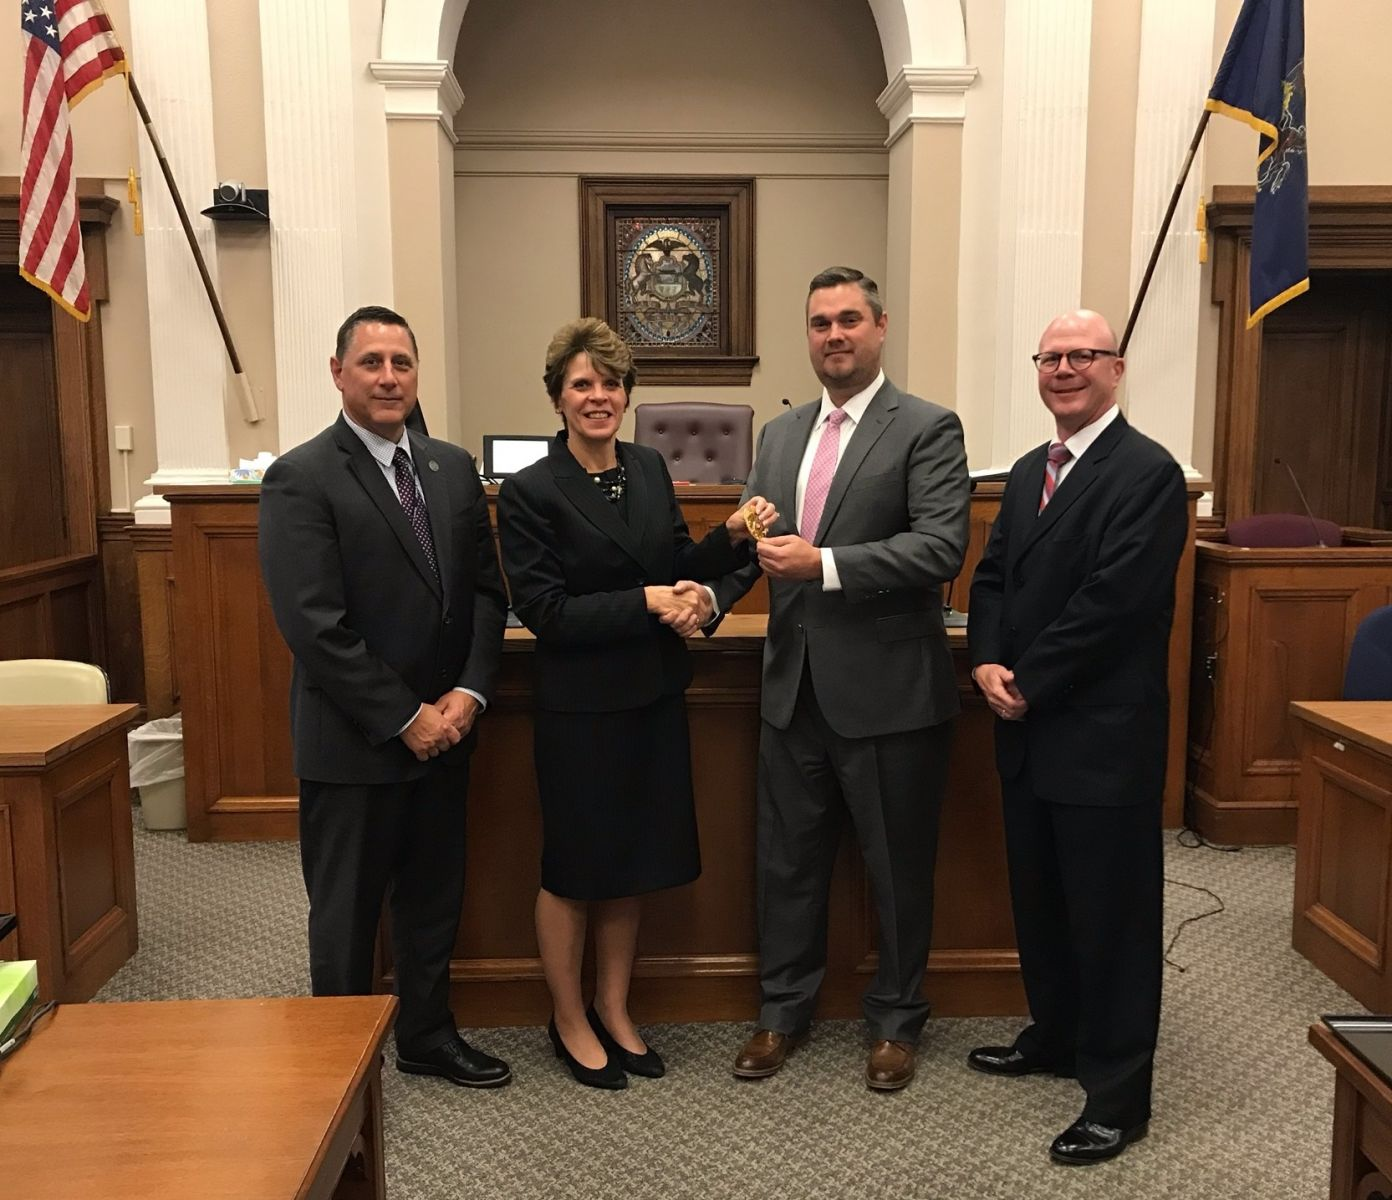 Above photo: (left to right)  Franklin County Court Administrator Mark Singer, President Judge Carol L. Van Horn, Chief Adult Probation Officer Douglas Wilburne, Judge Shawn D. Meyers